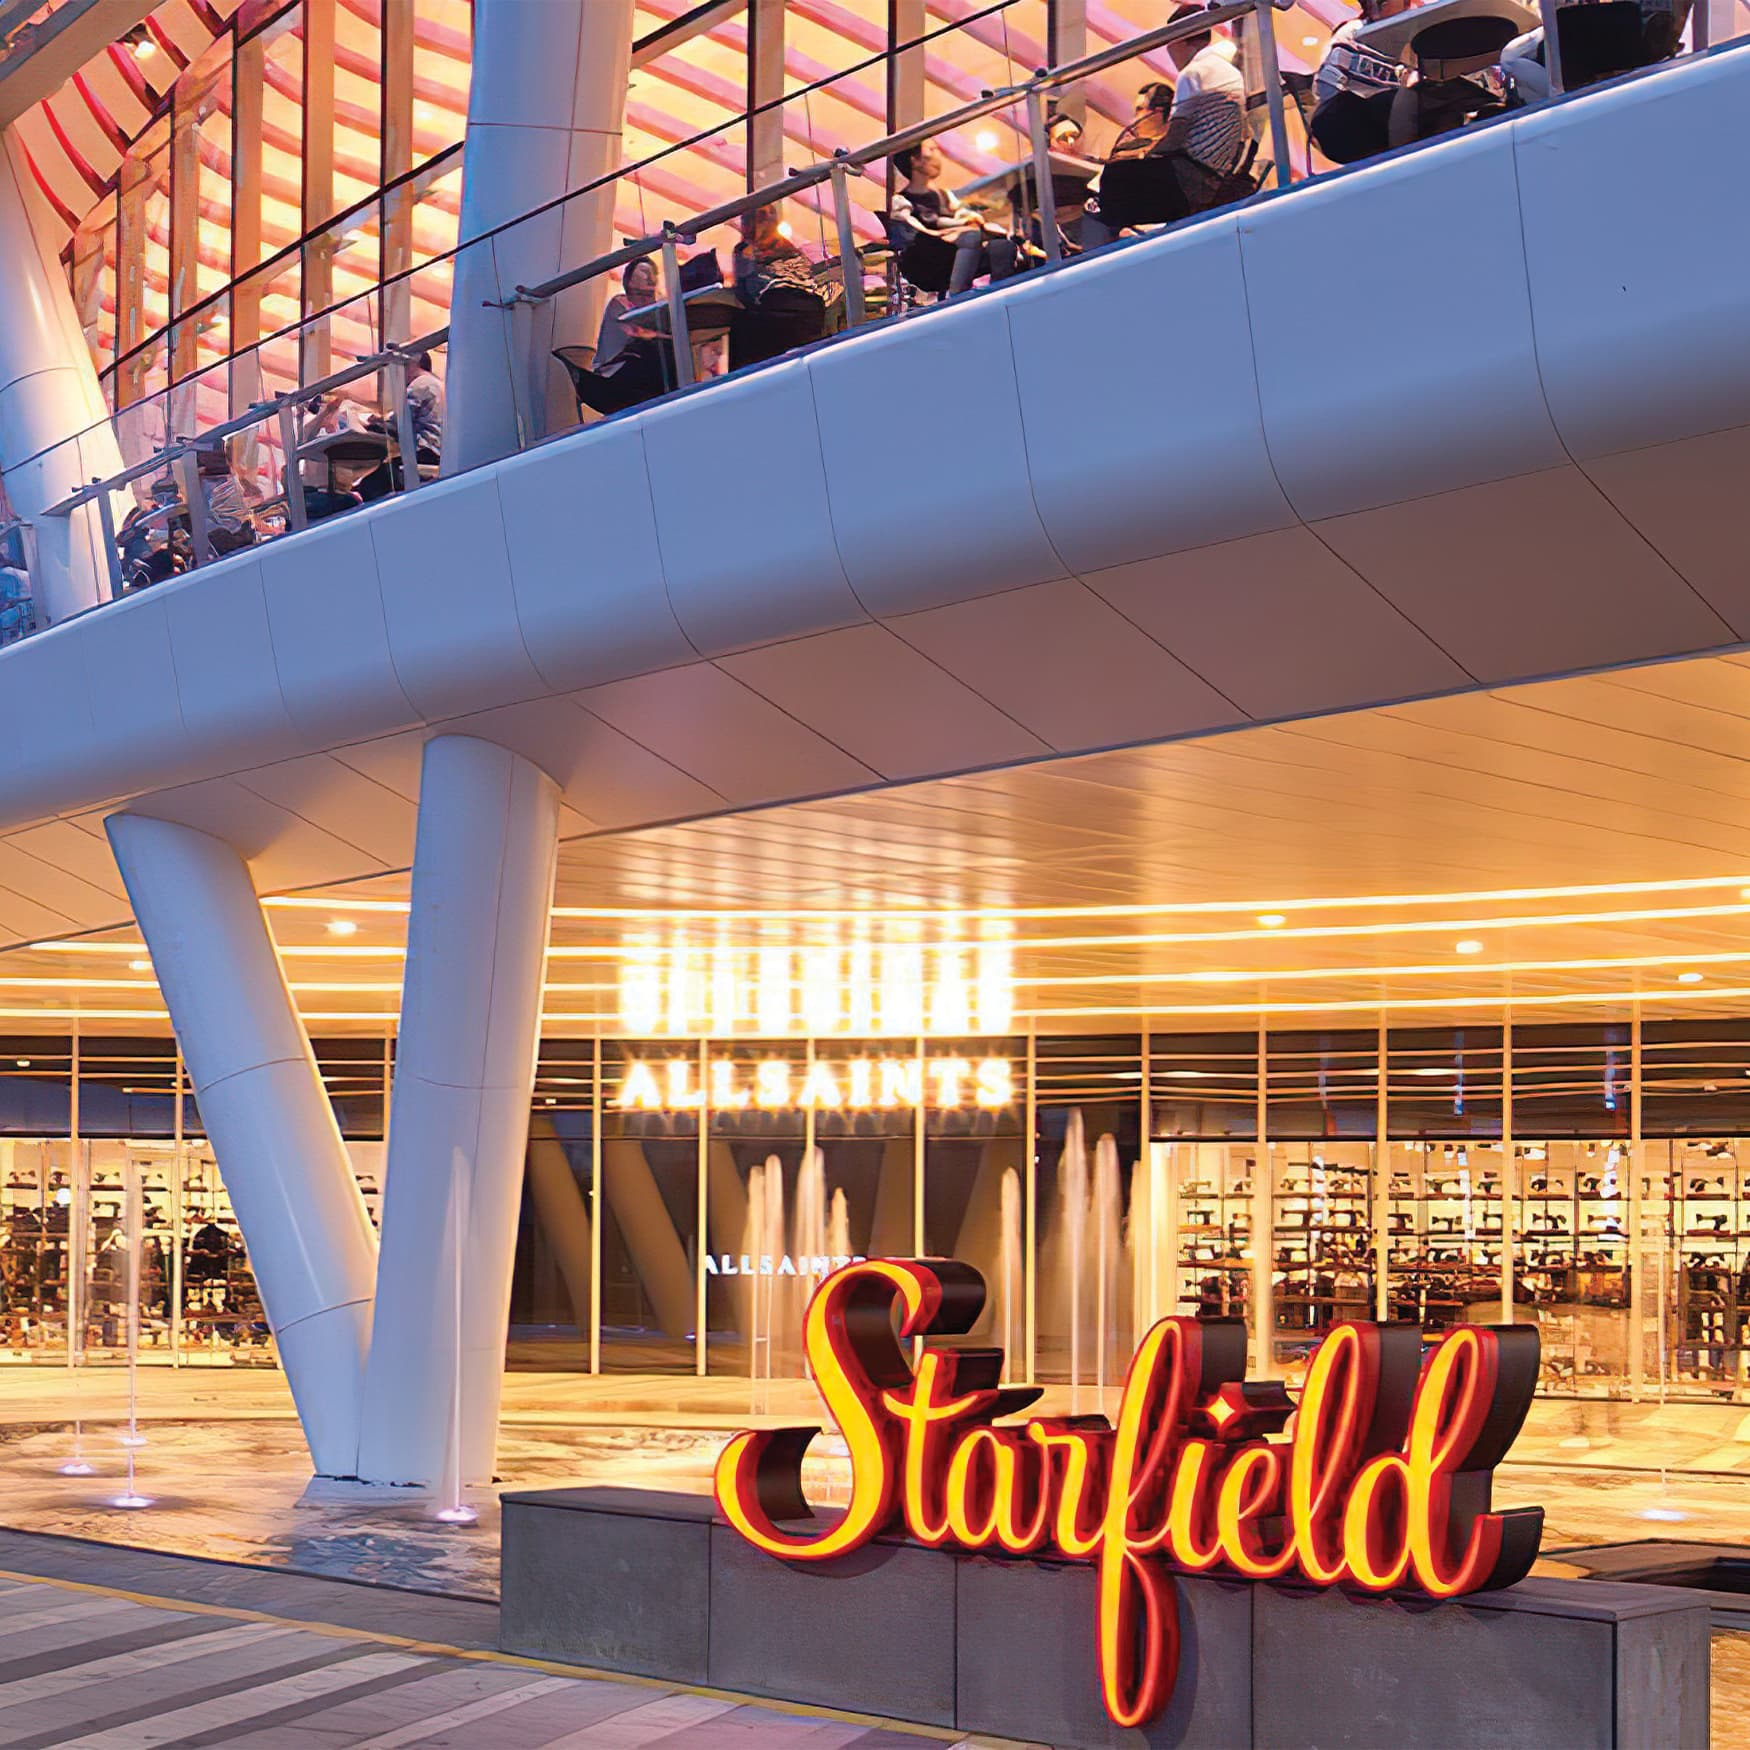 Shopping mall entrance with orange placemaking identity signage